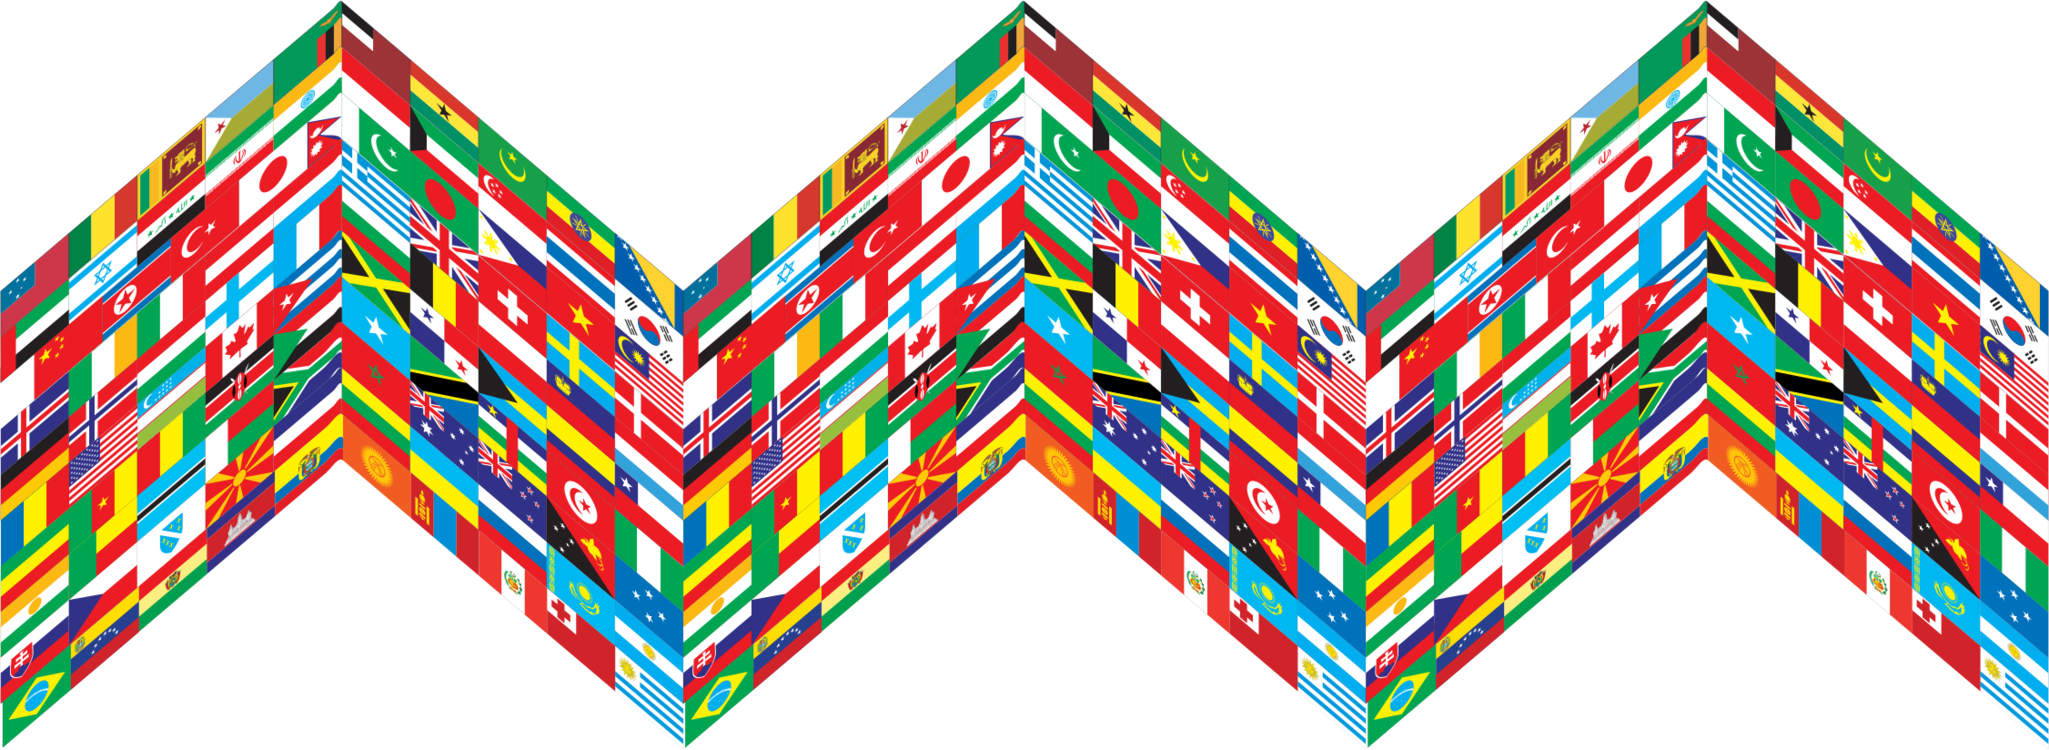 Line,Symmetry,Flag